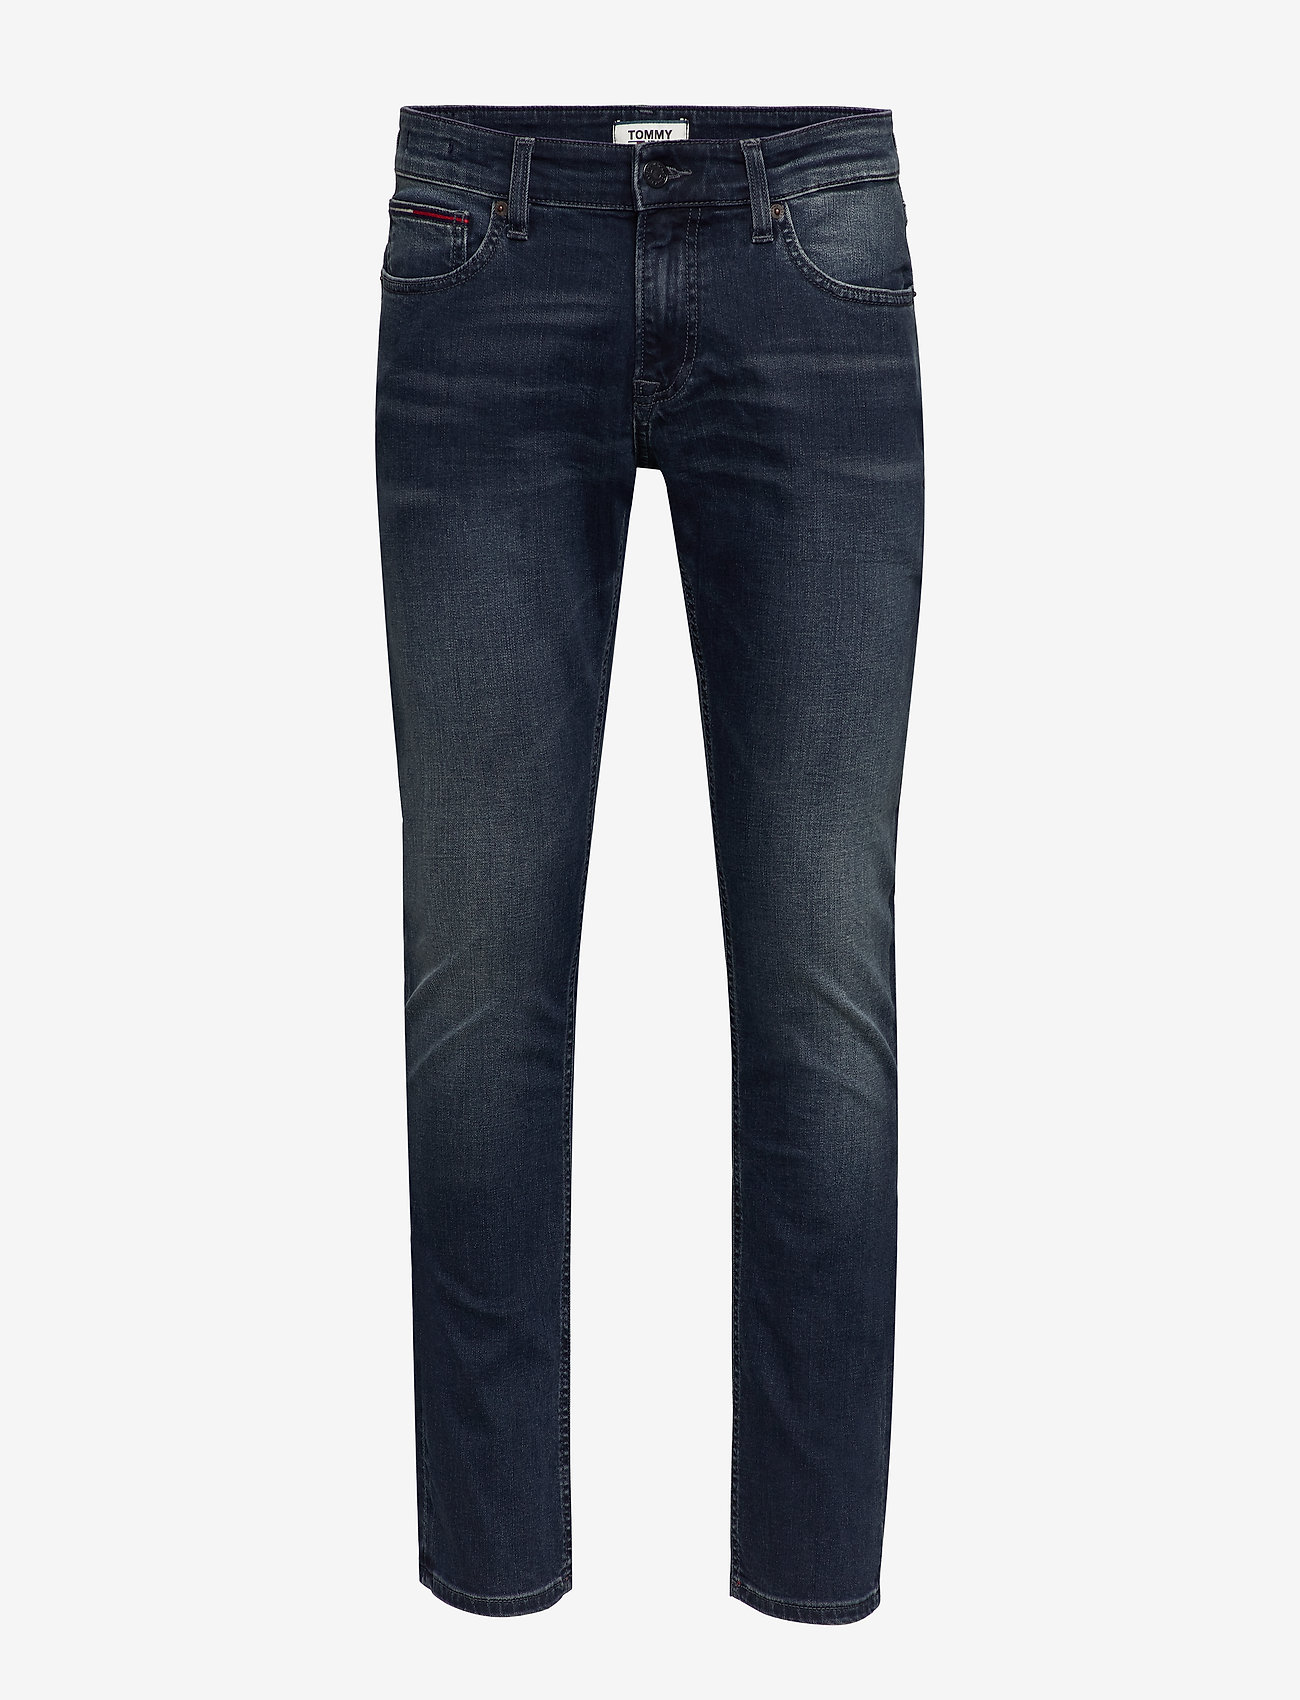 Tommy Jeans - SCANTON SLIM UTDK - slim jeans - utica dk bl str - 0